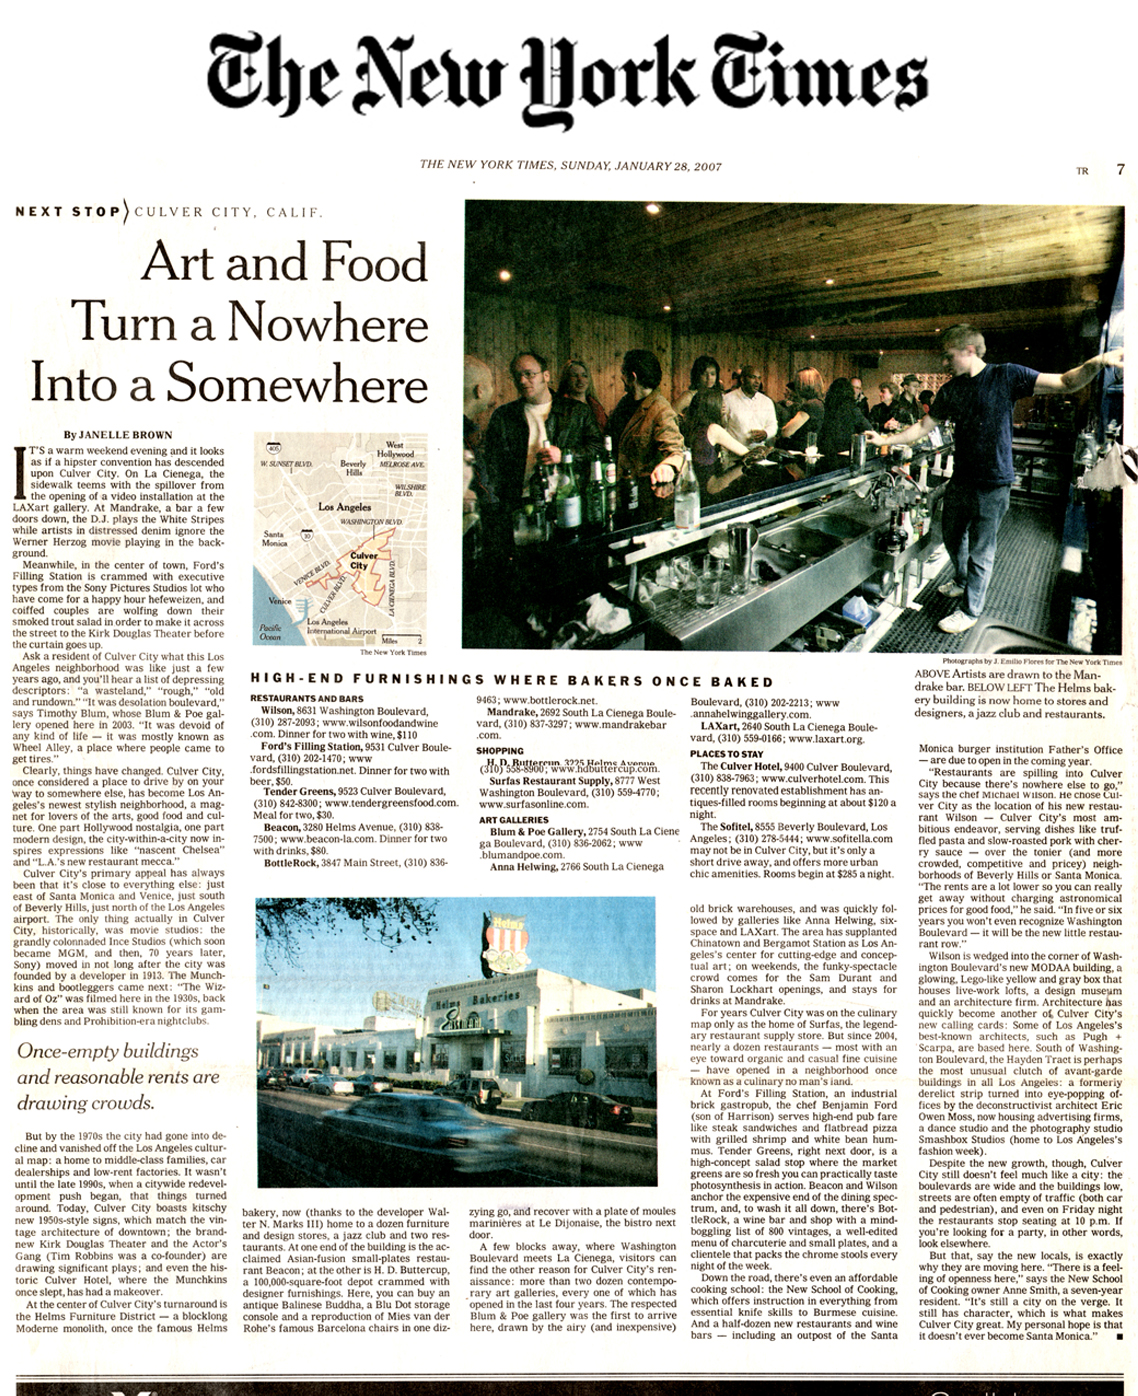 press.nytimes